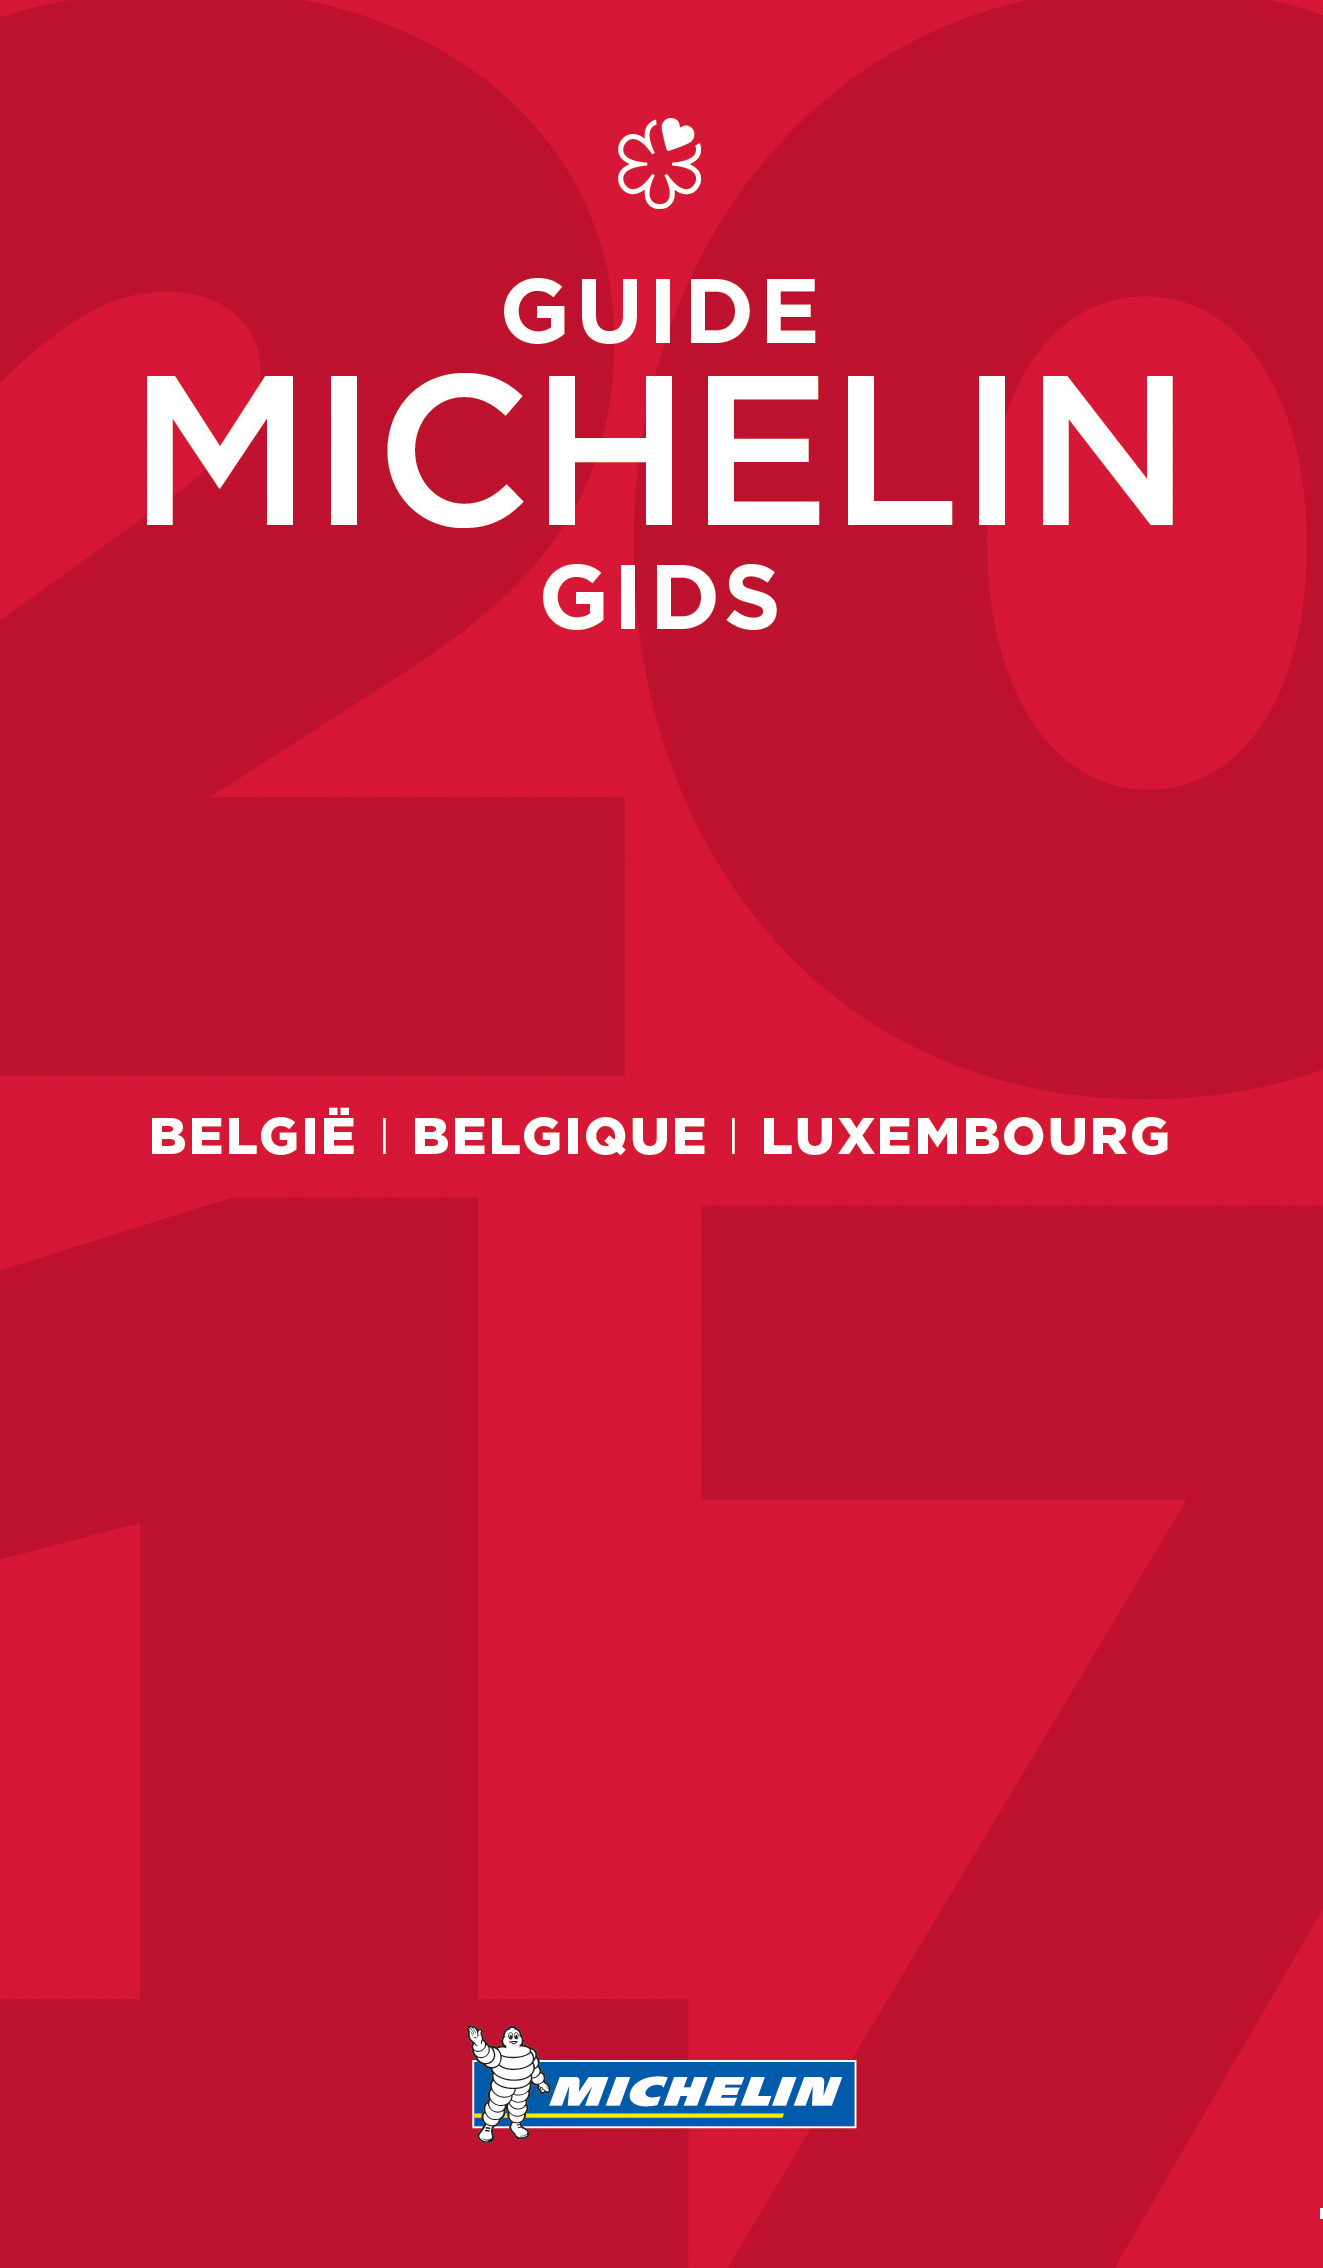 Michelin Gids België  + Luxemburg 2017 9782067214781  Michelin Rode Jaargidsen  Restaurantgidsen België & Luxemburg